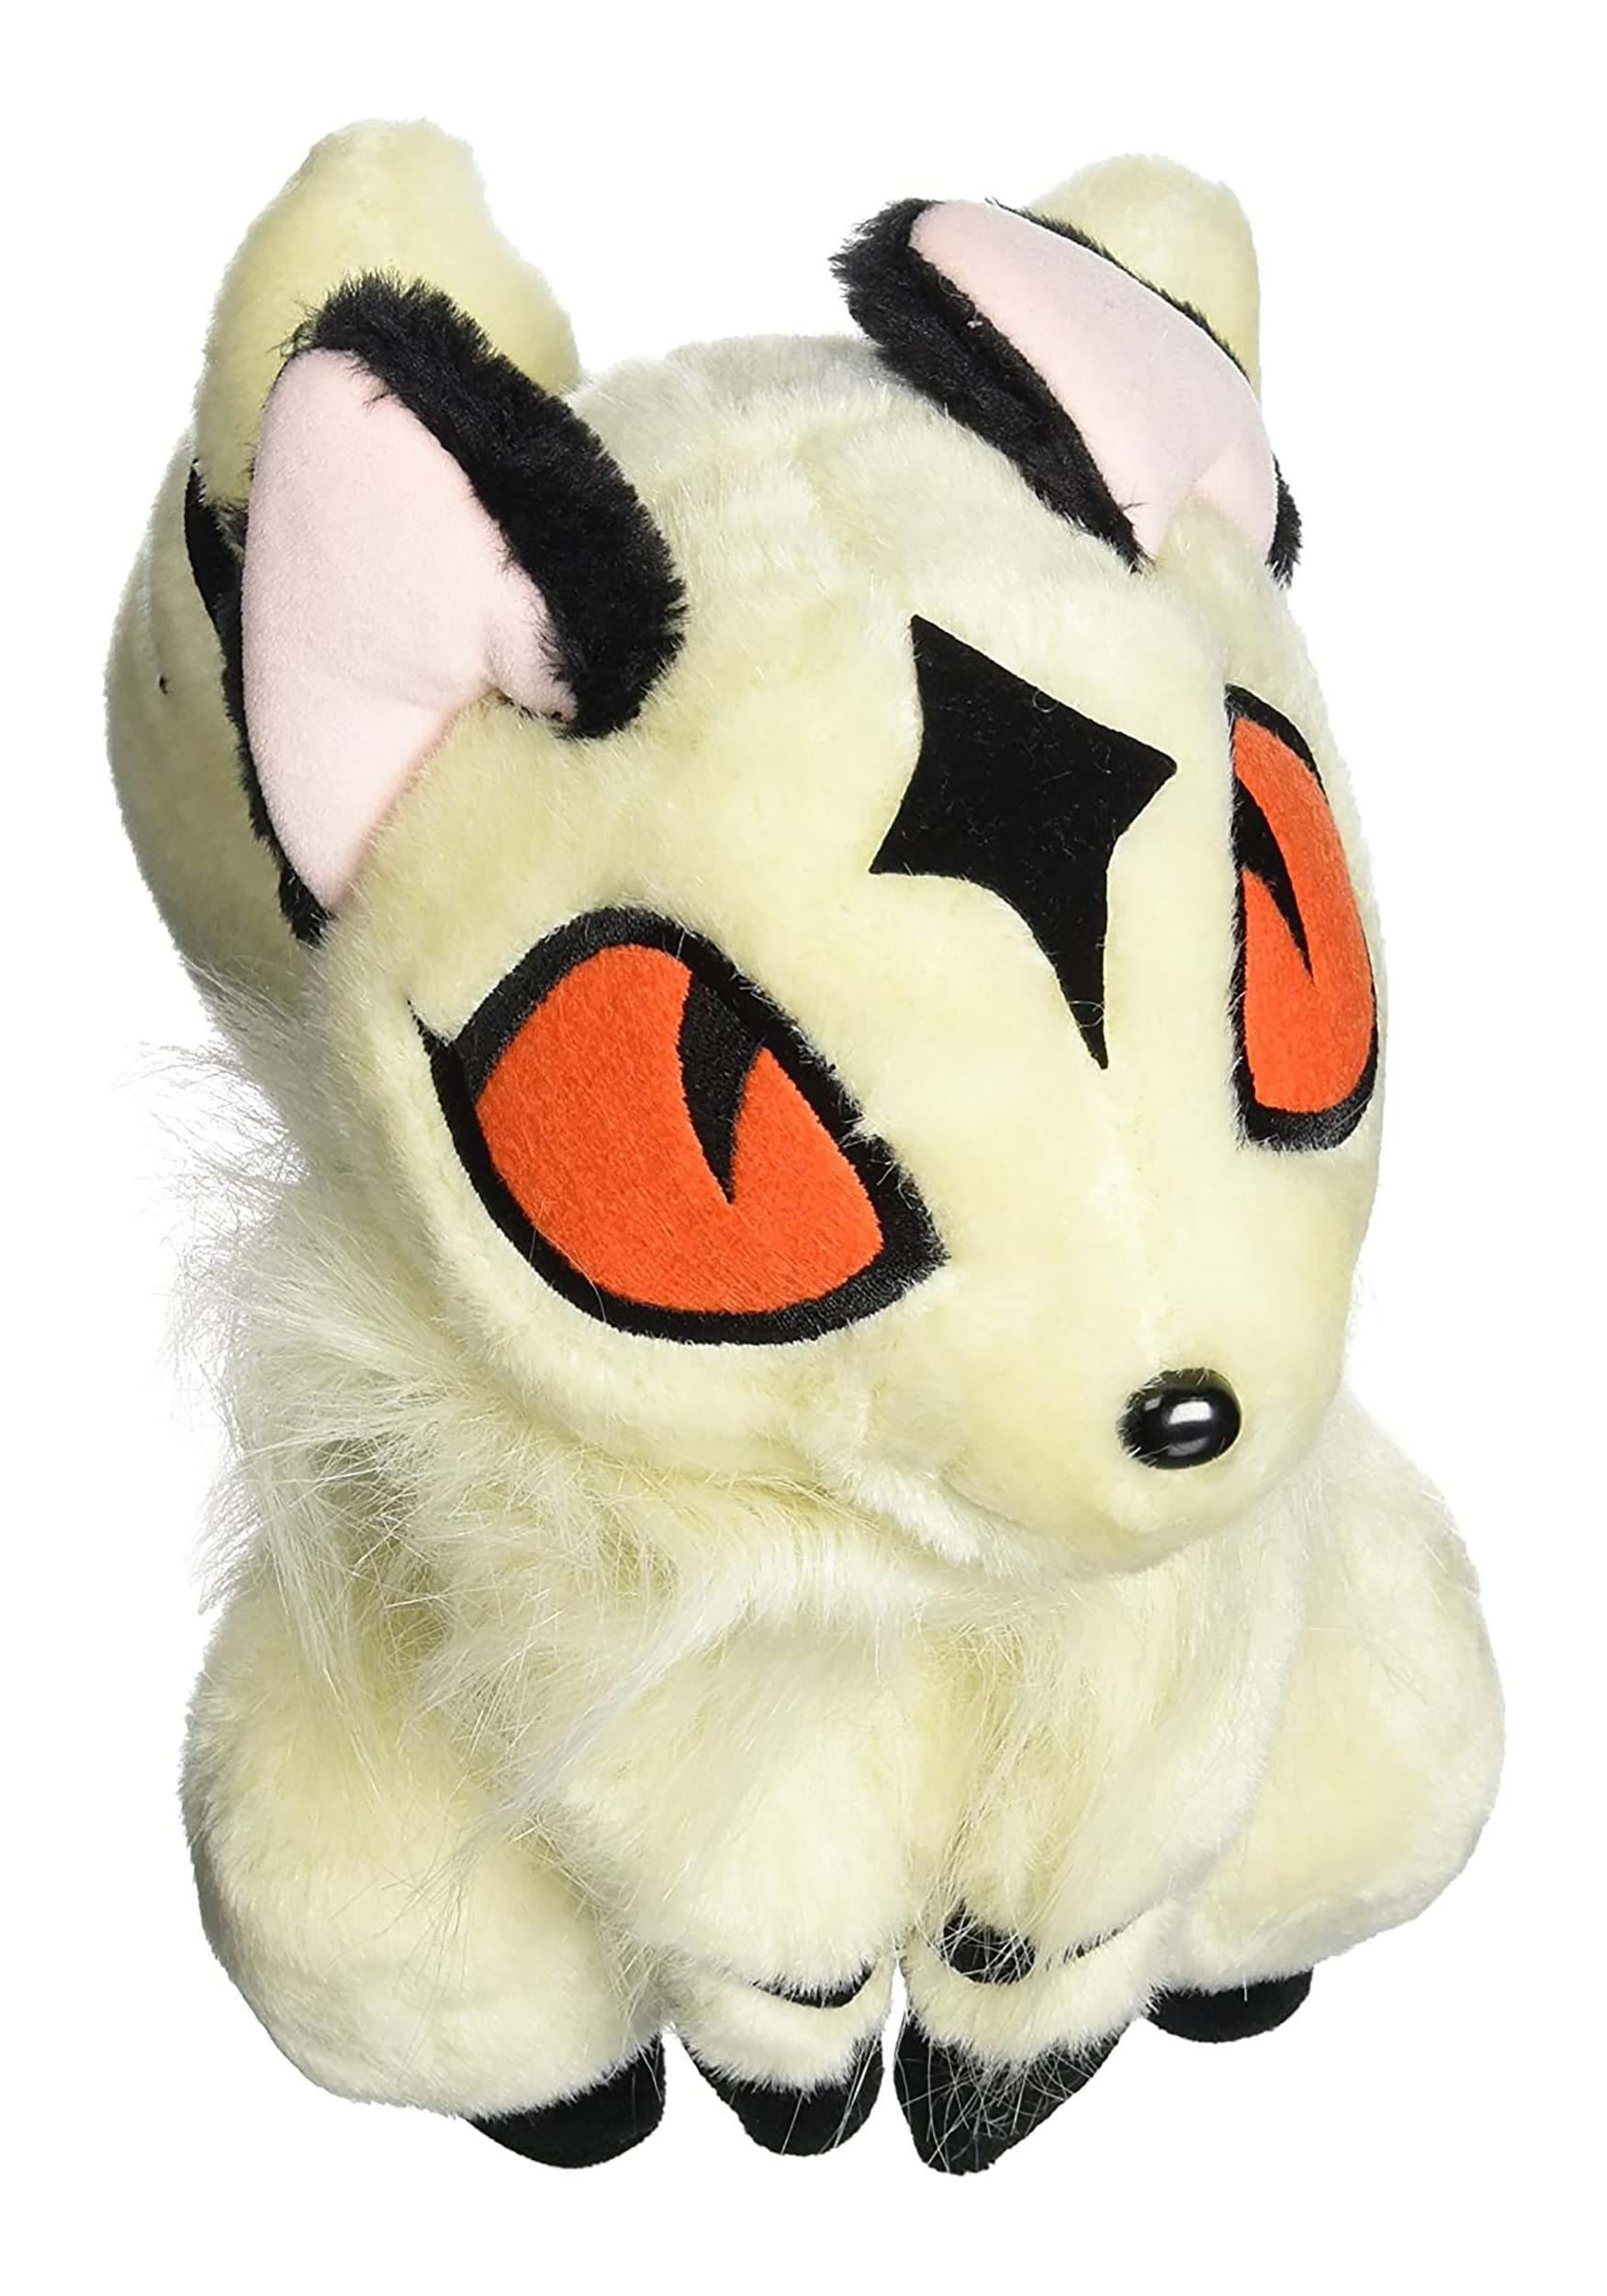 Inuyasha Kirara cat plush toy